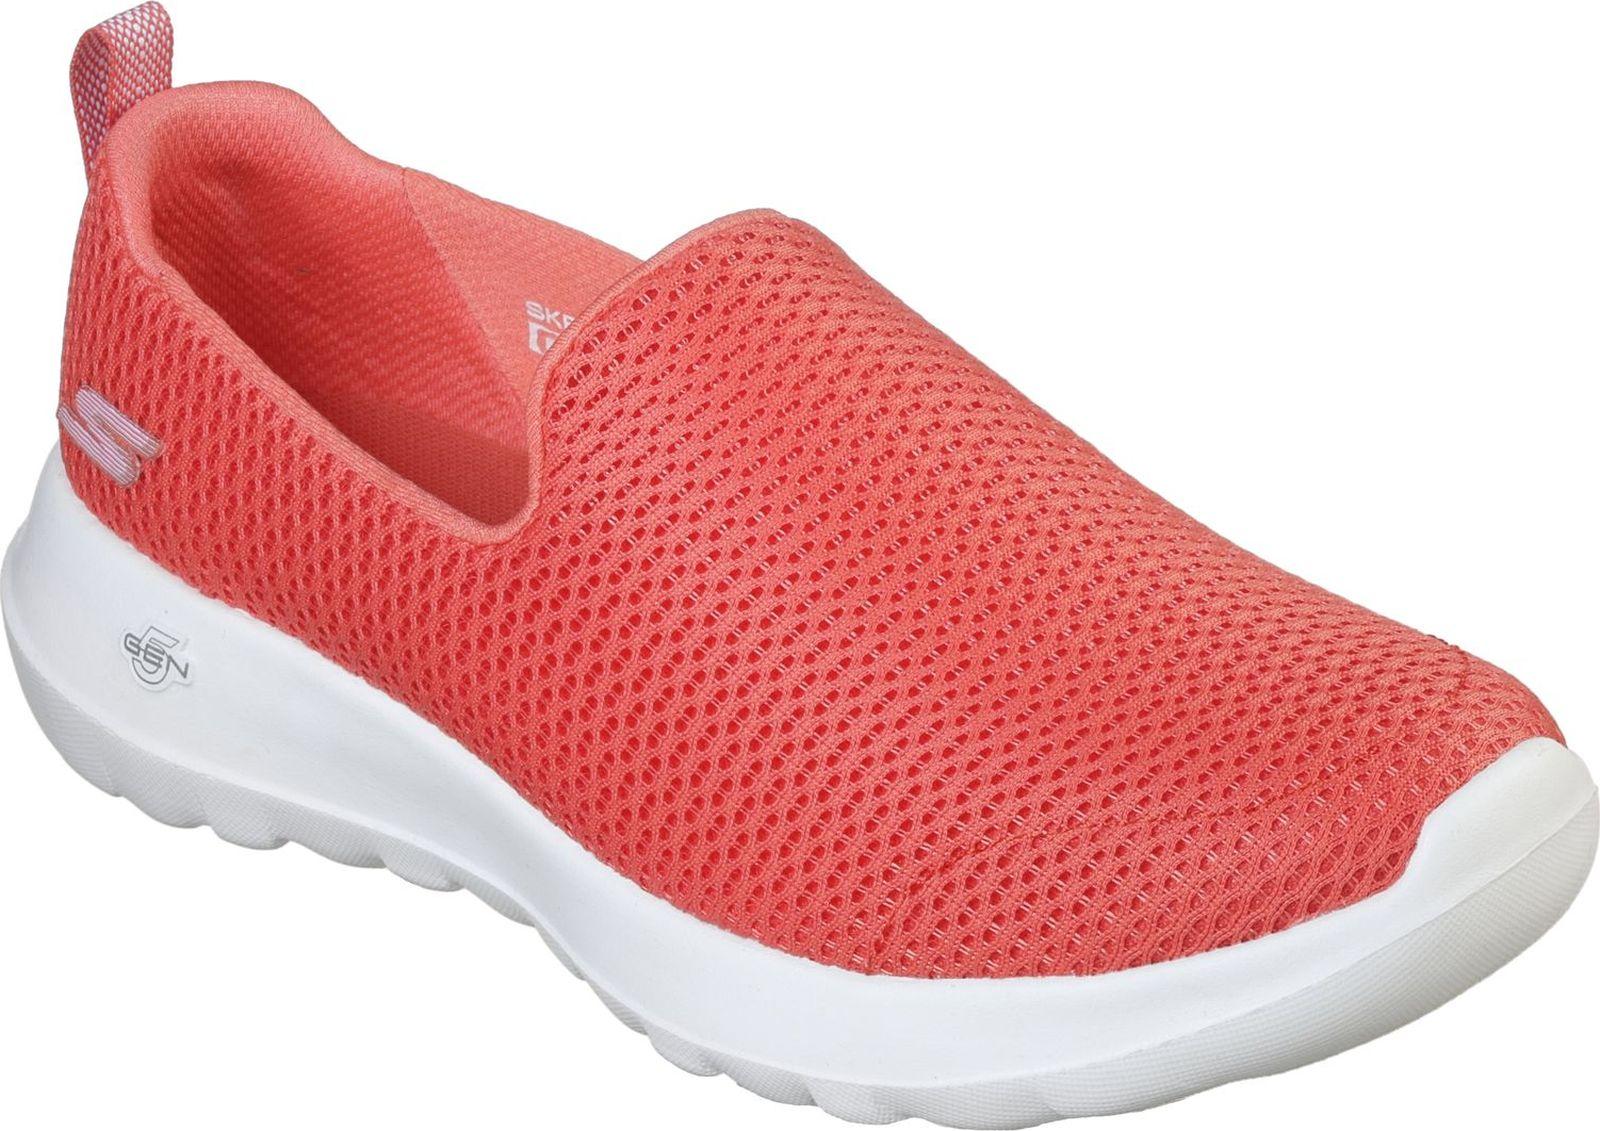 44f7820ad Skechers кроссовки женские skechers go walk revolution ultra размер ...